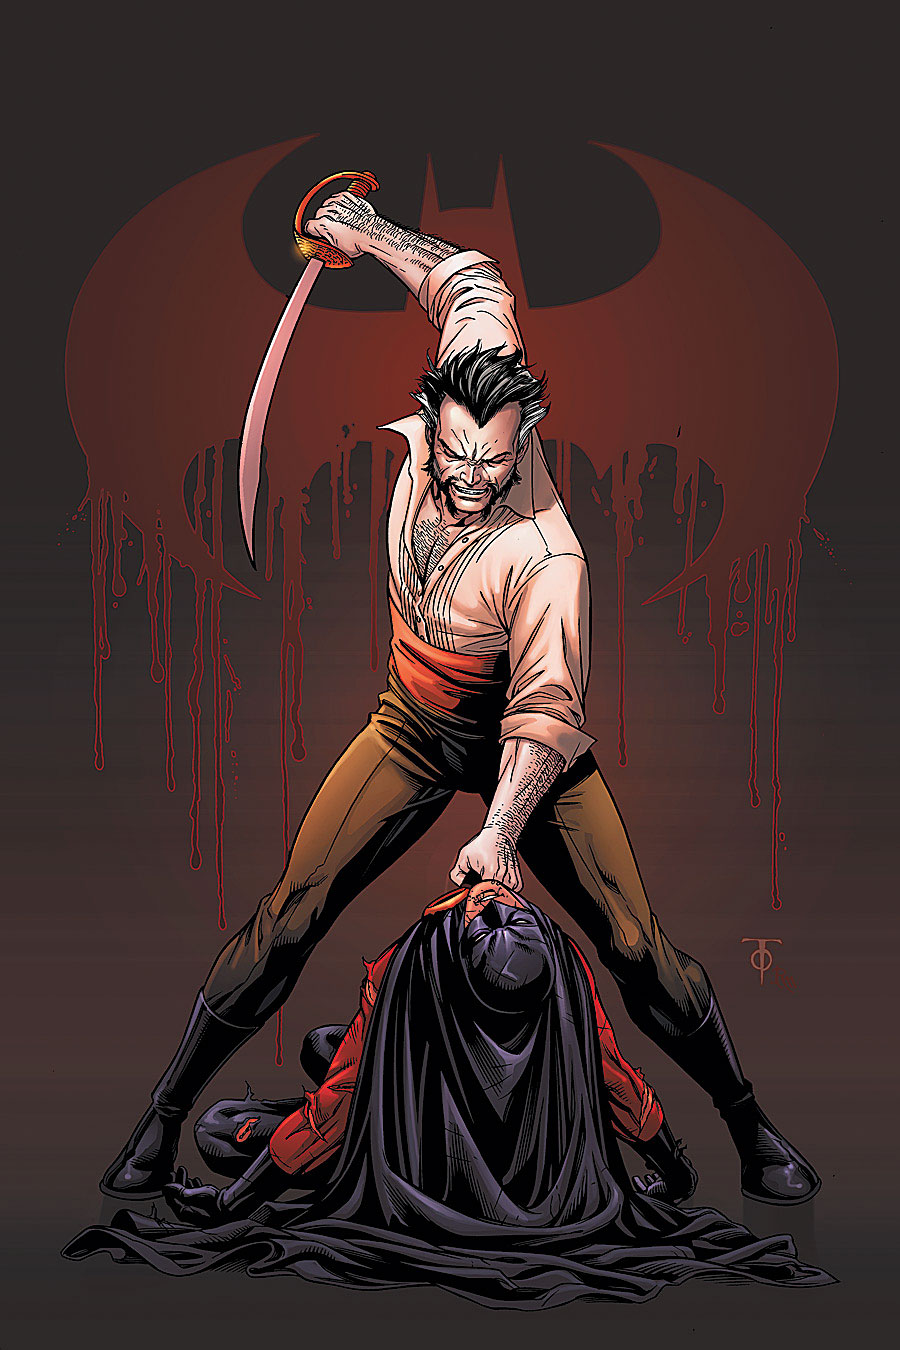 Harley vs batman and robin 8